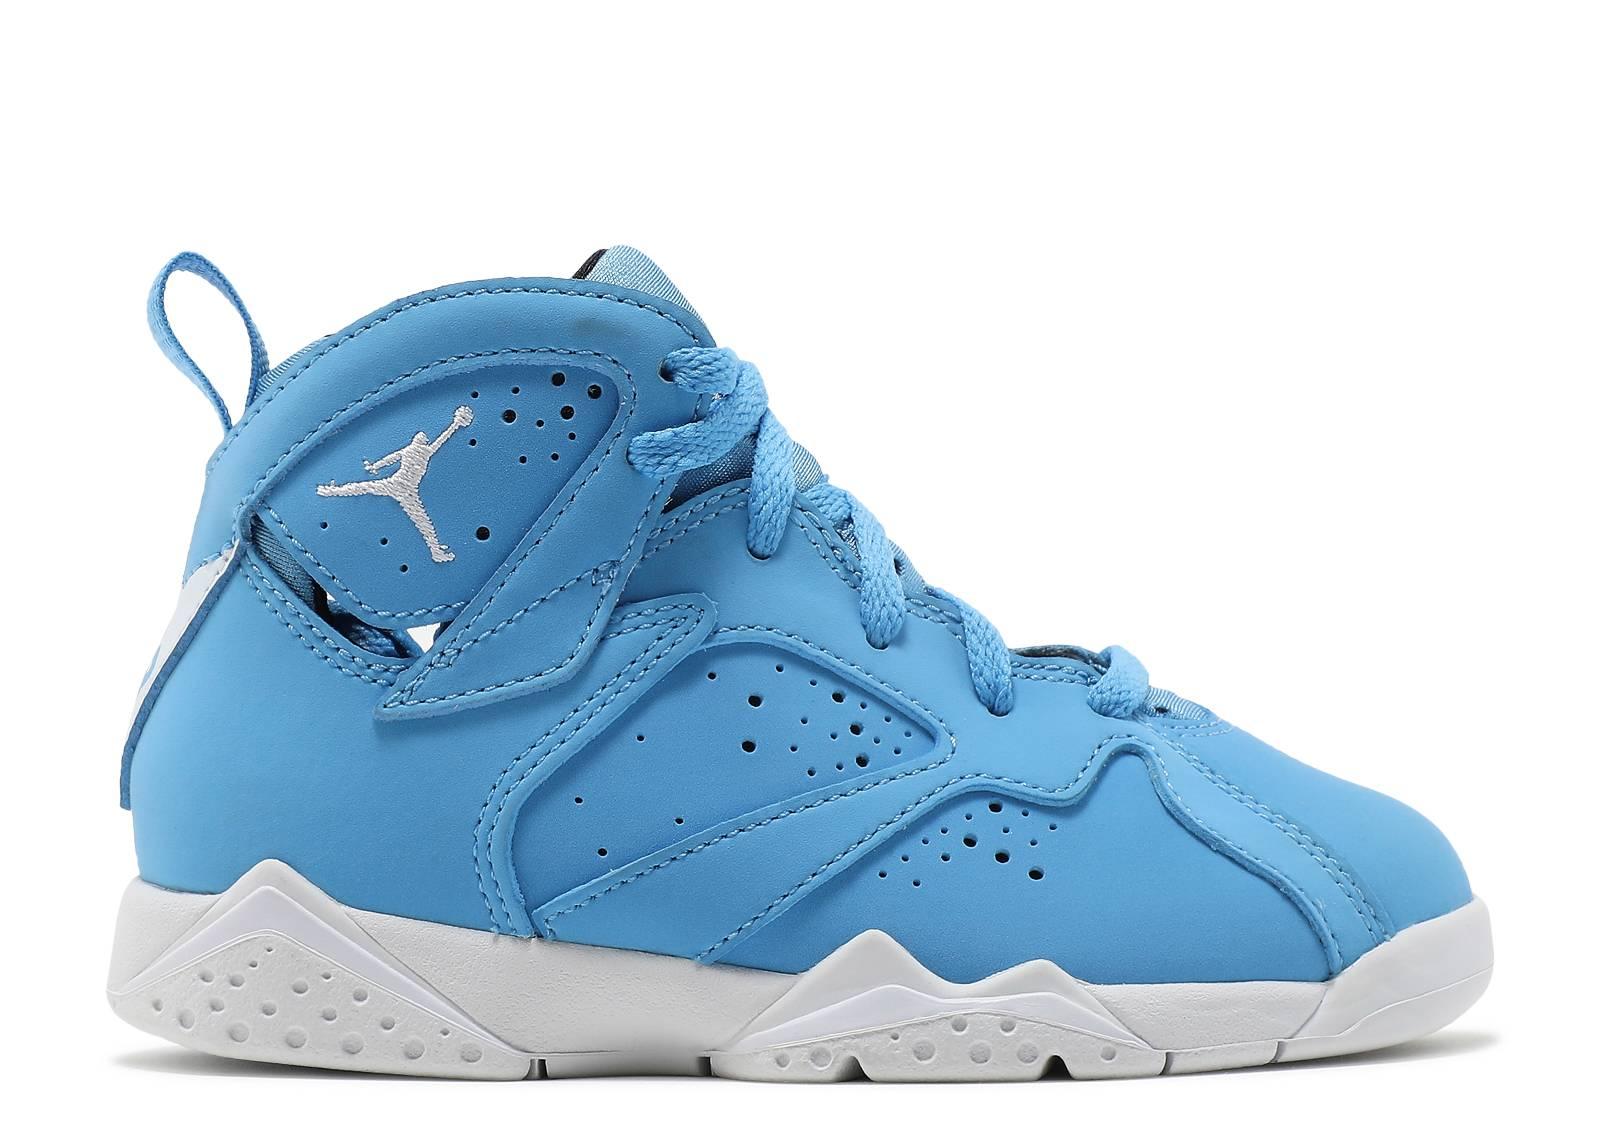 a511266a052a8 Jordan 7 Retro Bp - Air Jordan - 304773 400 - university blue white ...